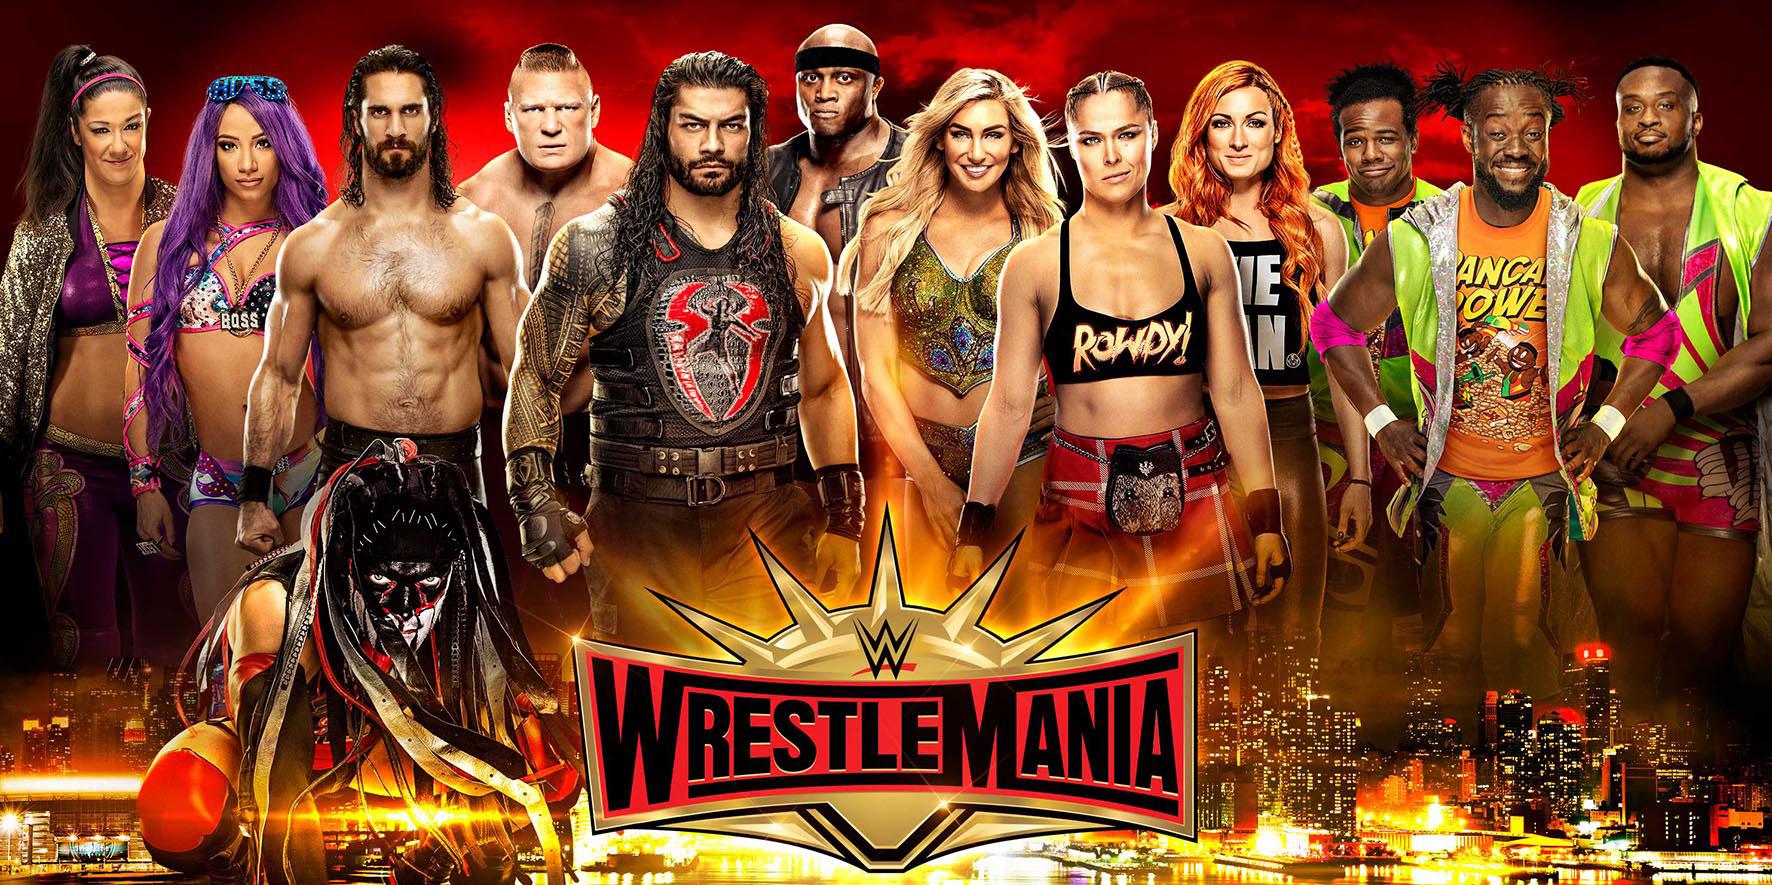 WWE rencontres quiz dattes Sugar papas